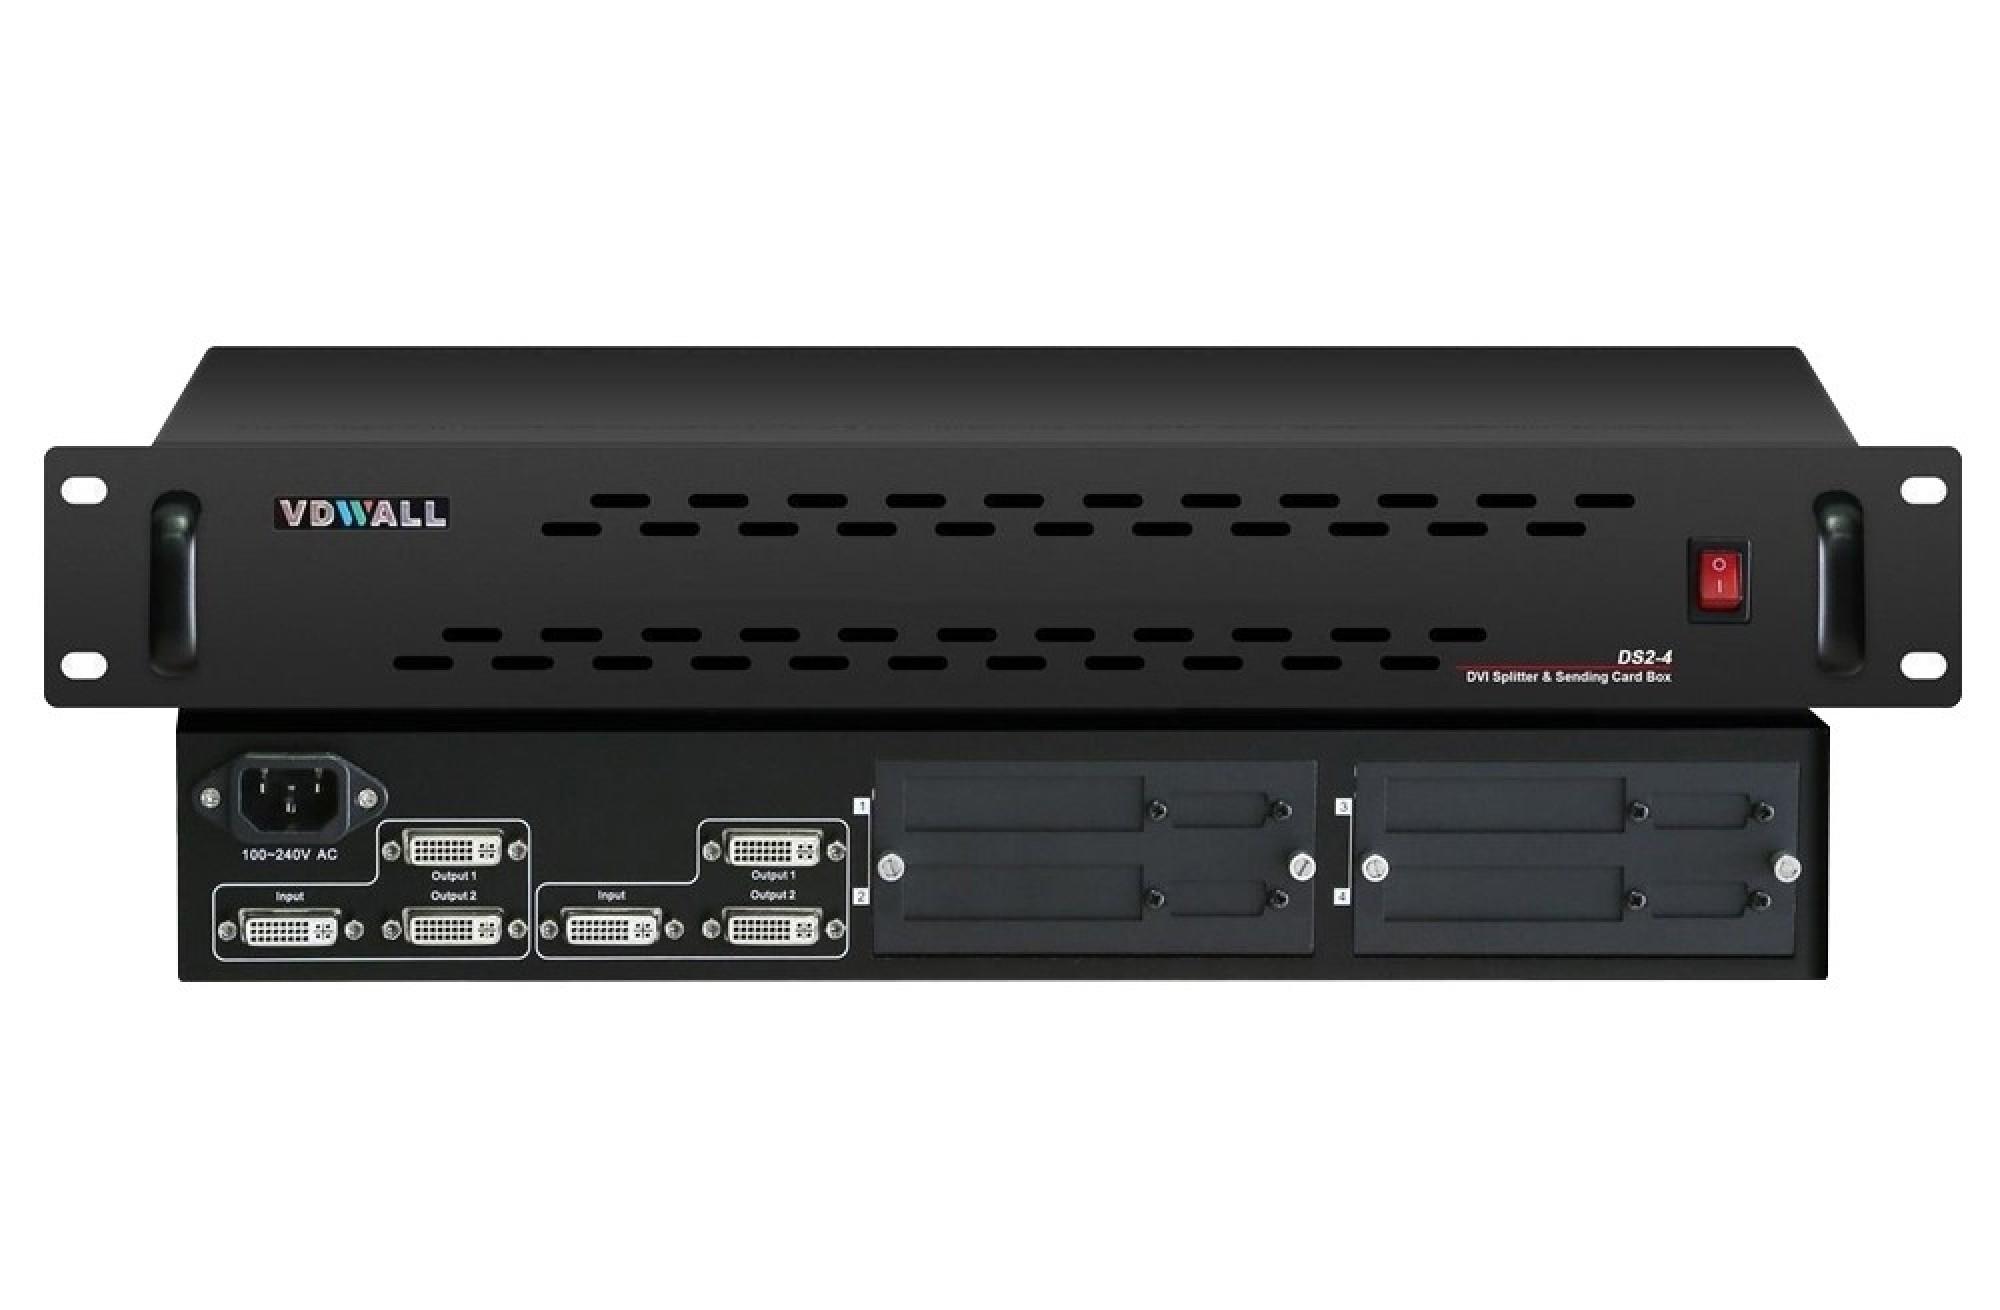 VDWALL DS2-4 DVI Splitter+Sending Card Signal Amplifying Controller Box